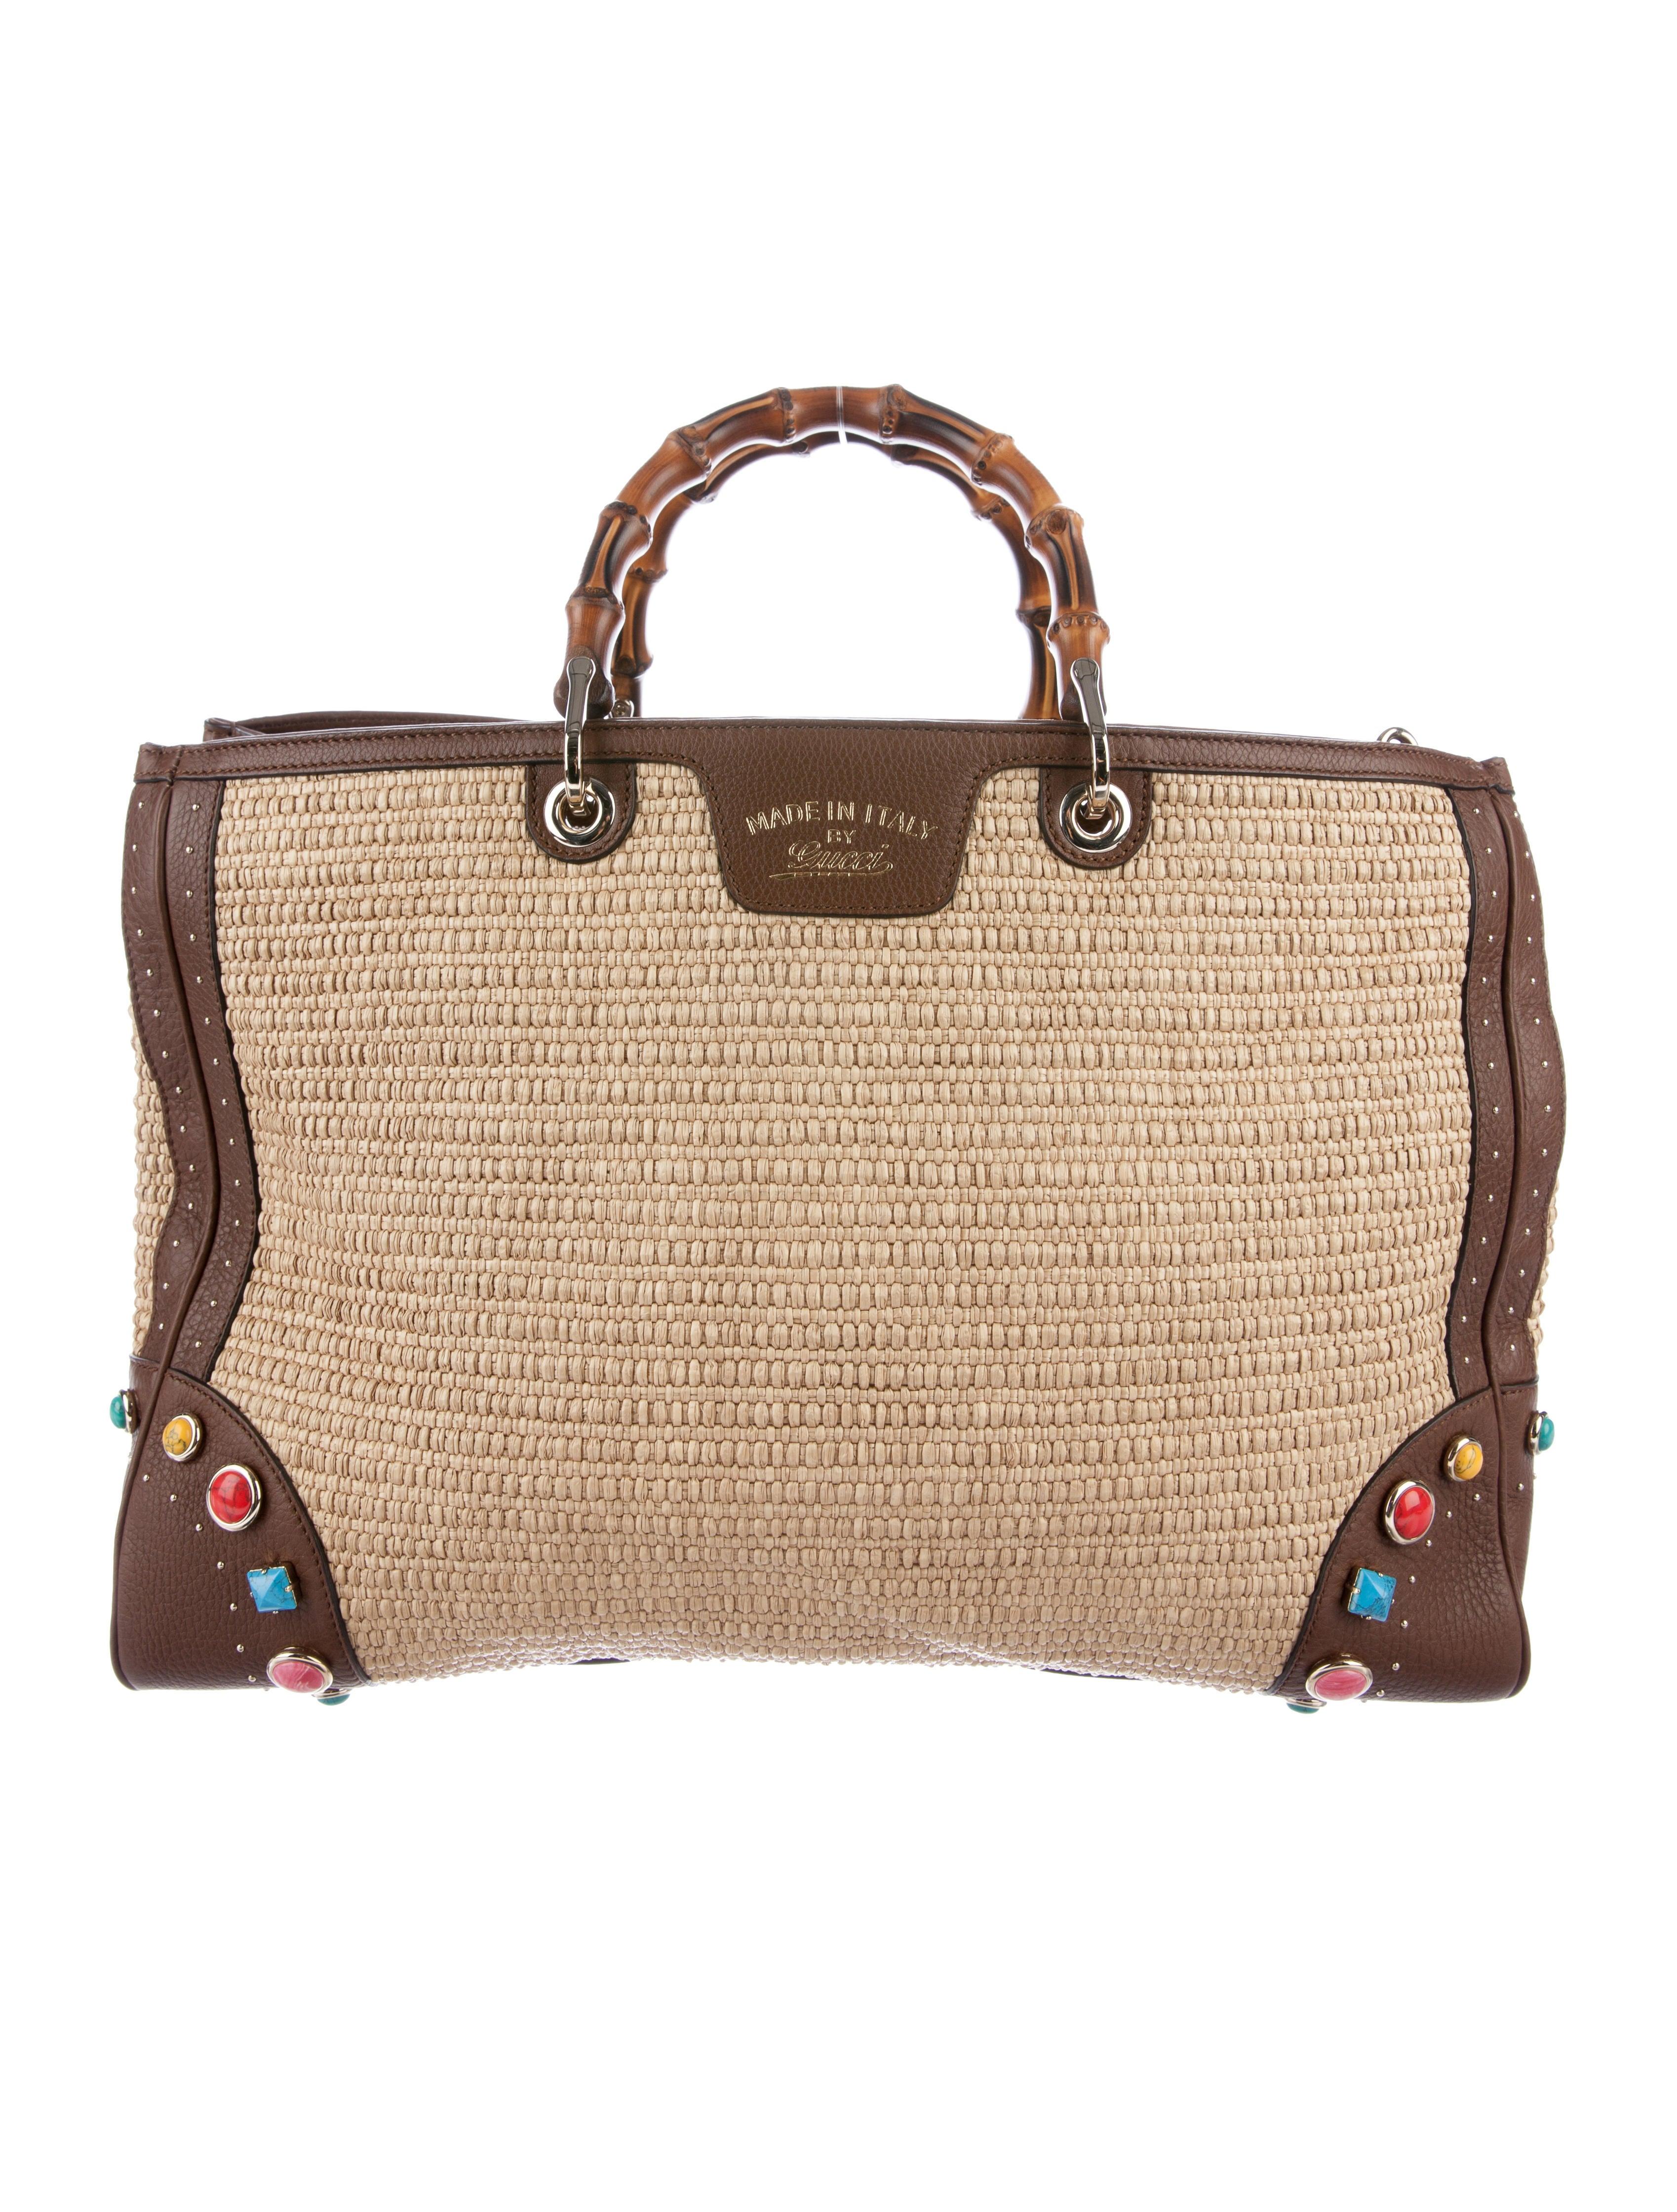 gucci bamboo shopper tote handbags guc169391 the realreal. Black Bedroom Furniture Sets. Home Design Ideas